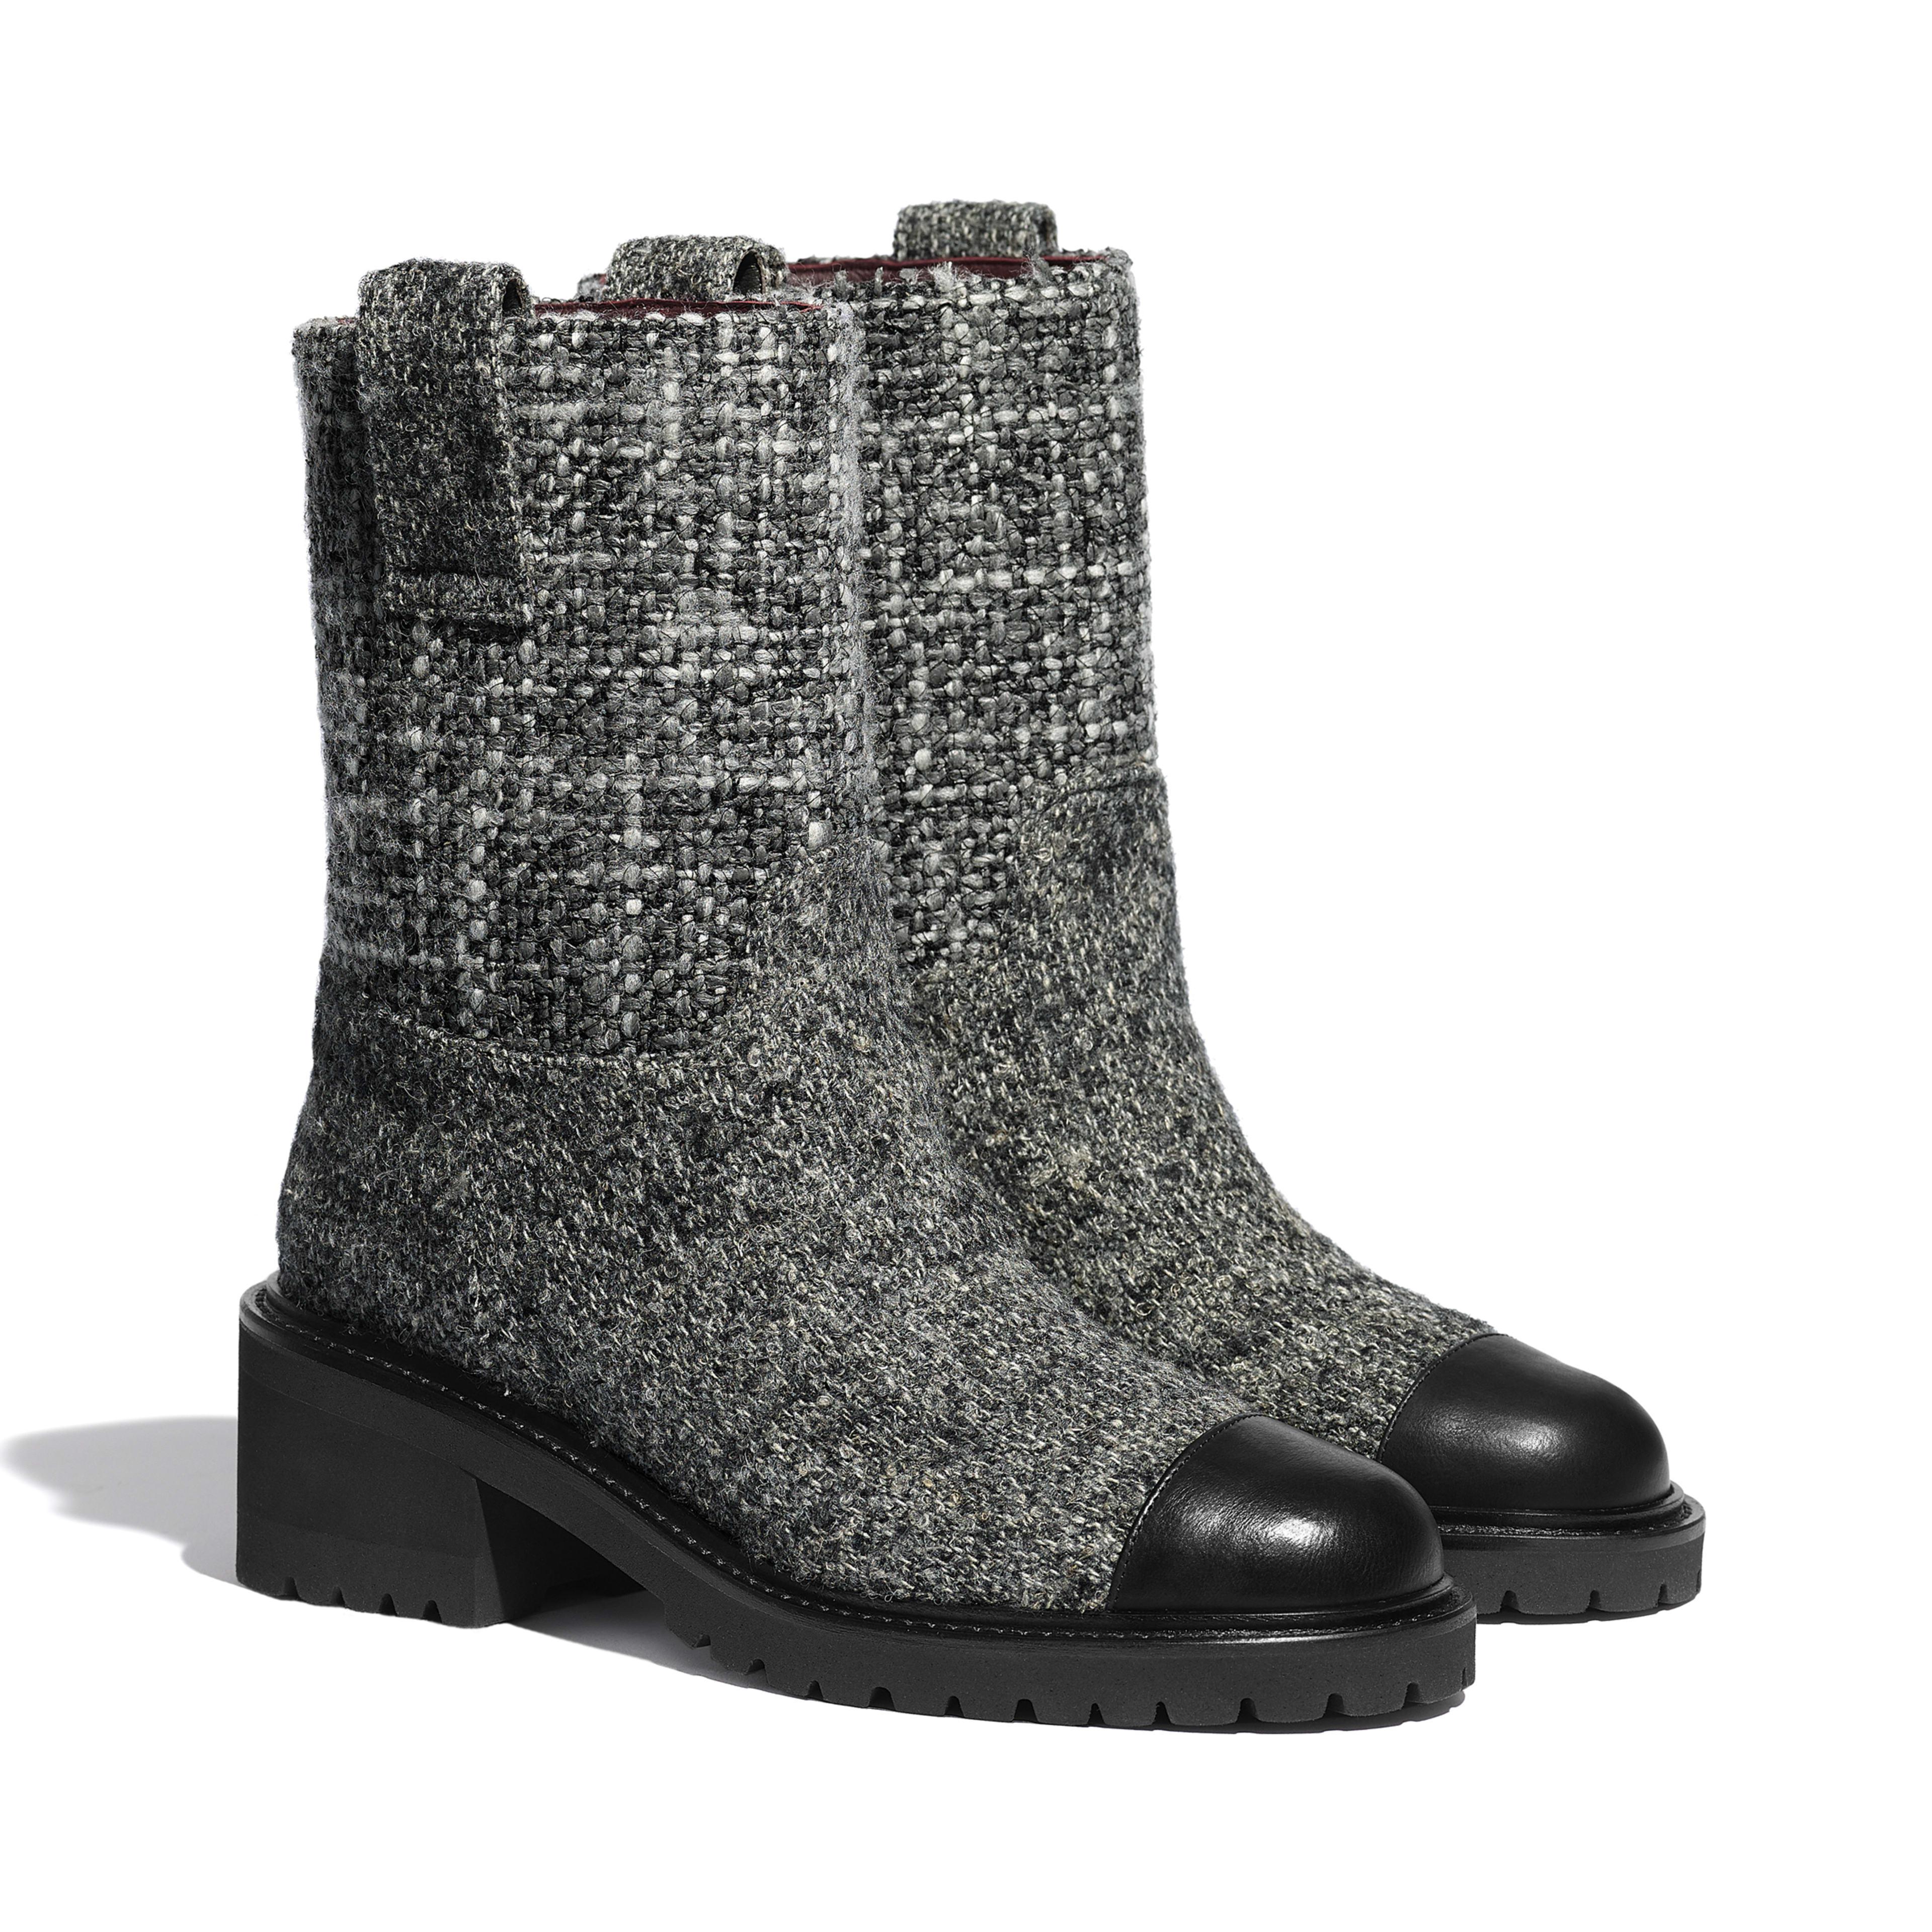 Calfskin Gray \u0026 Black Ankle Boots | CHANEL